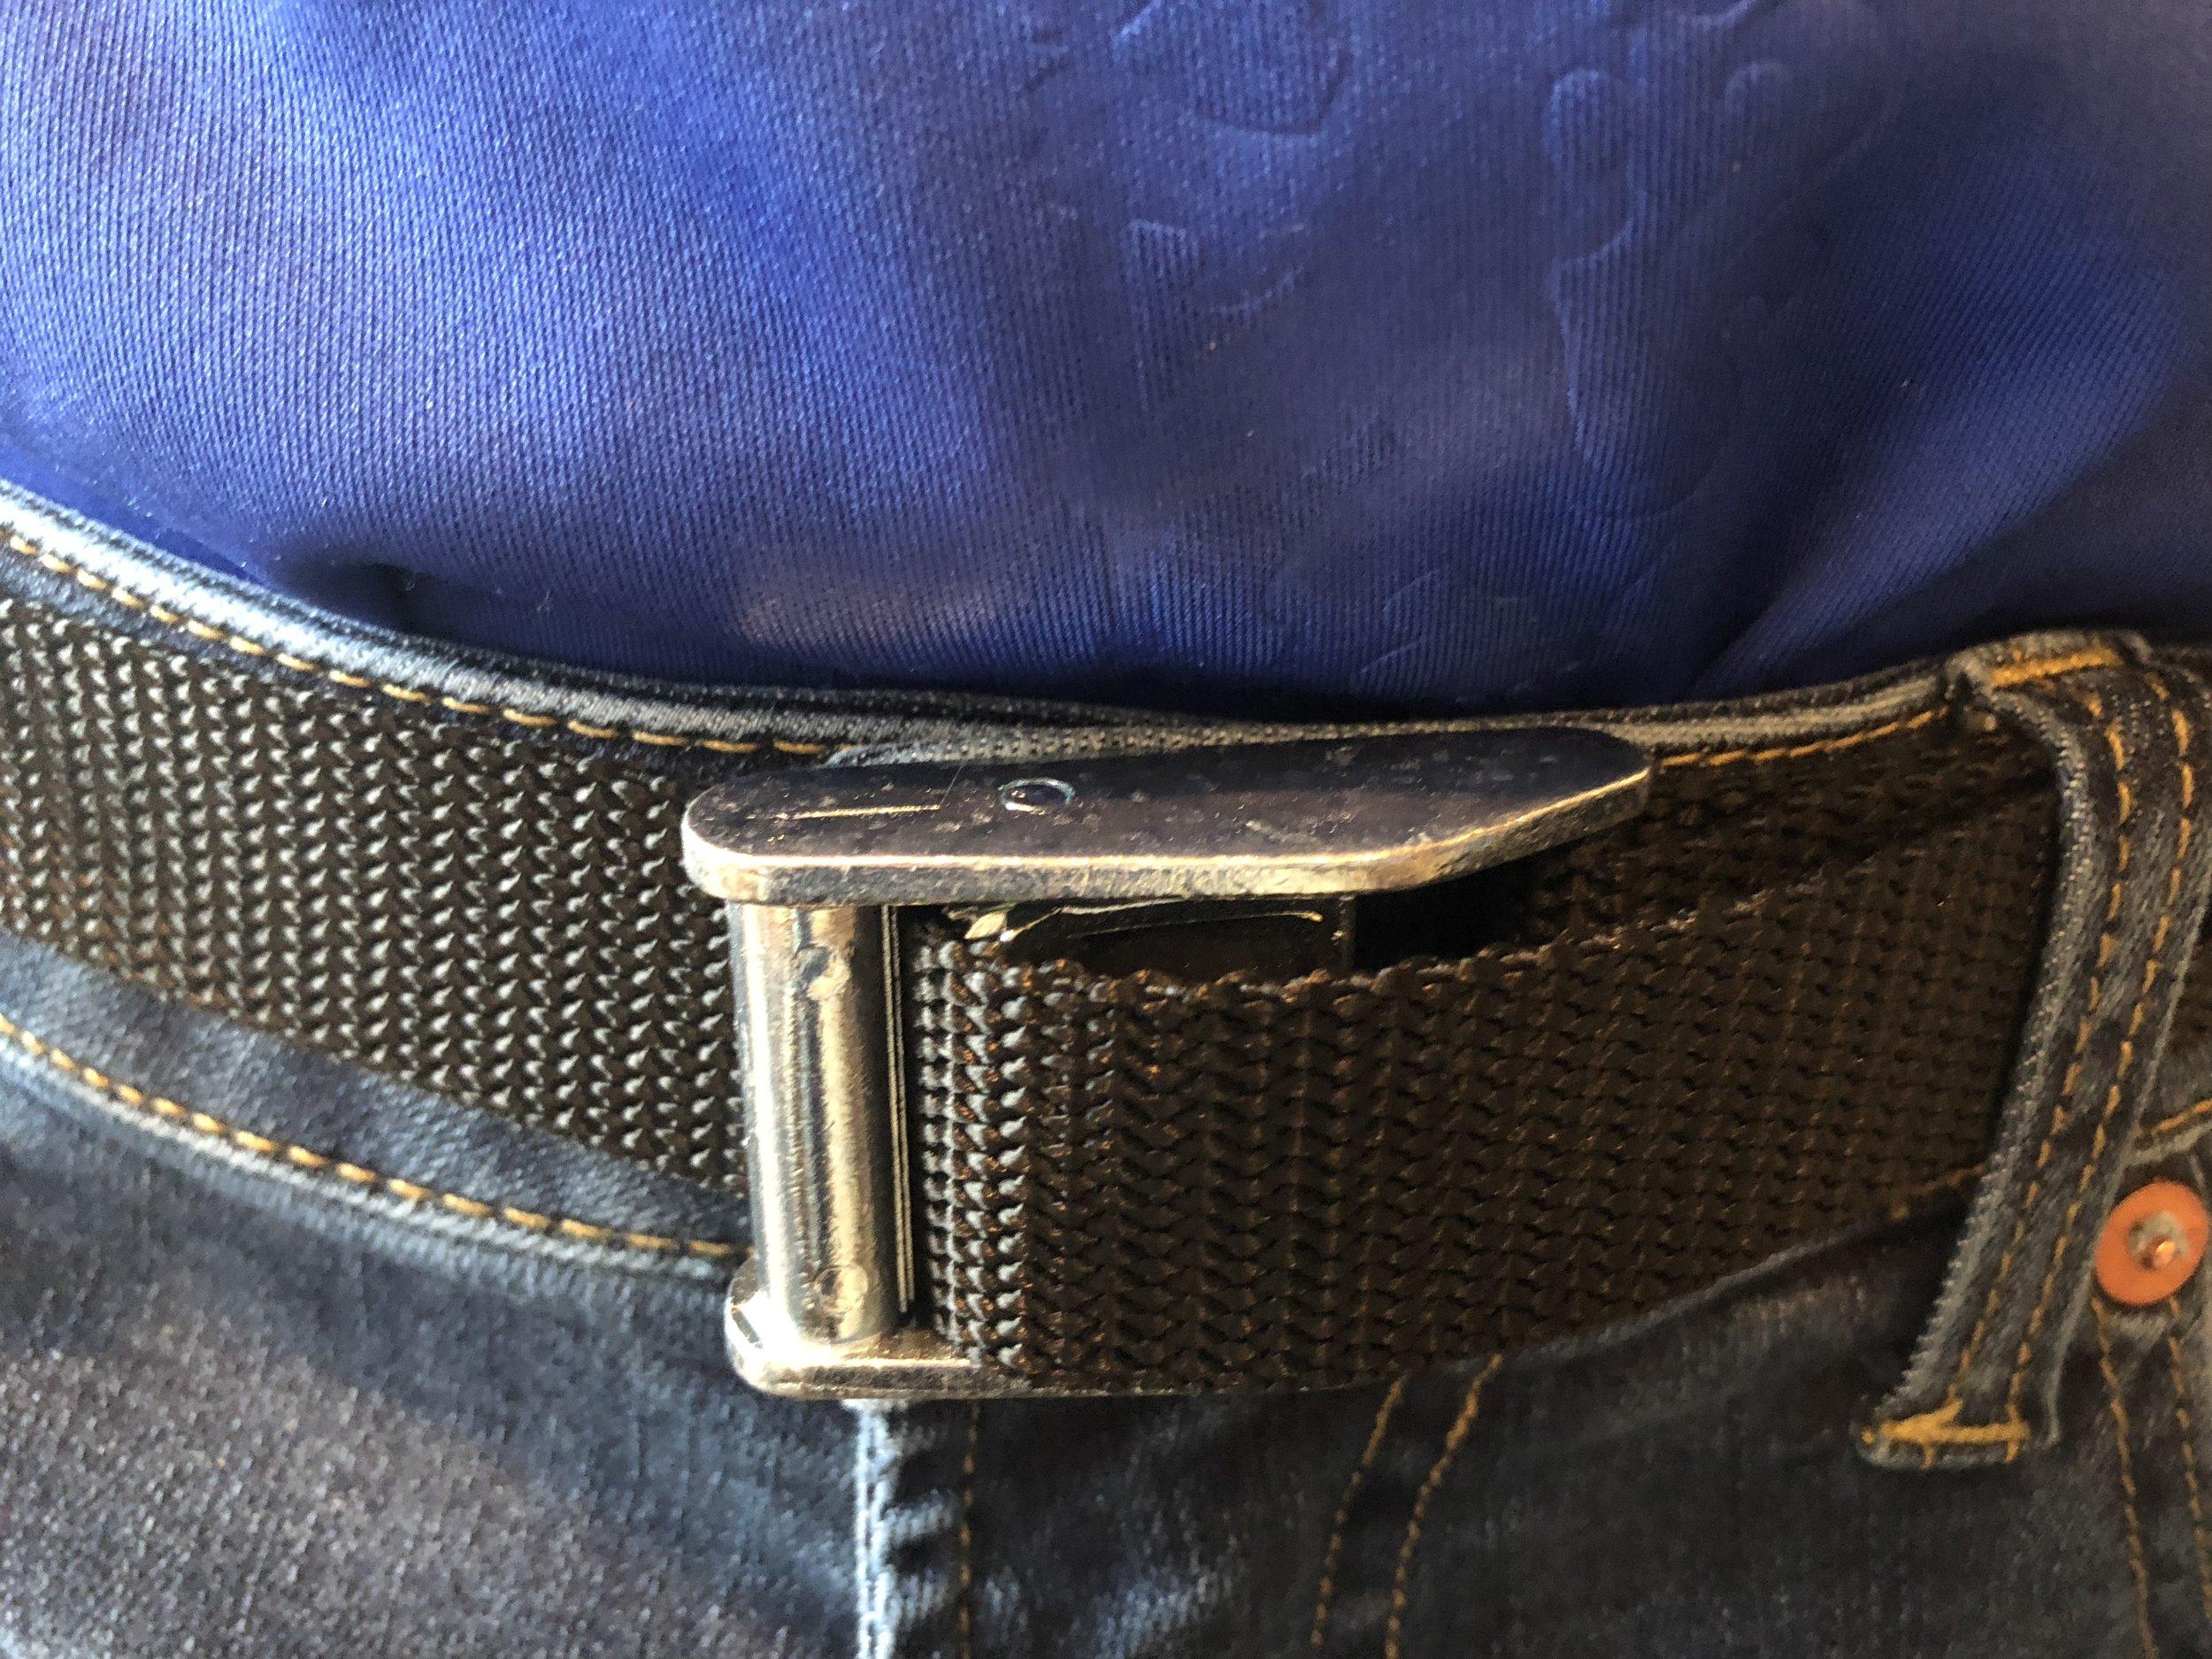 Apparently the Wrangler Straps make a good belt?